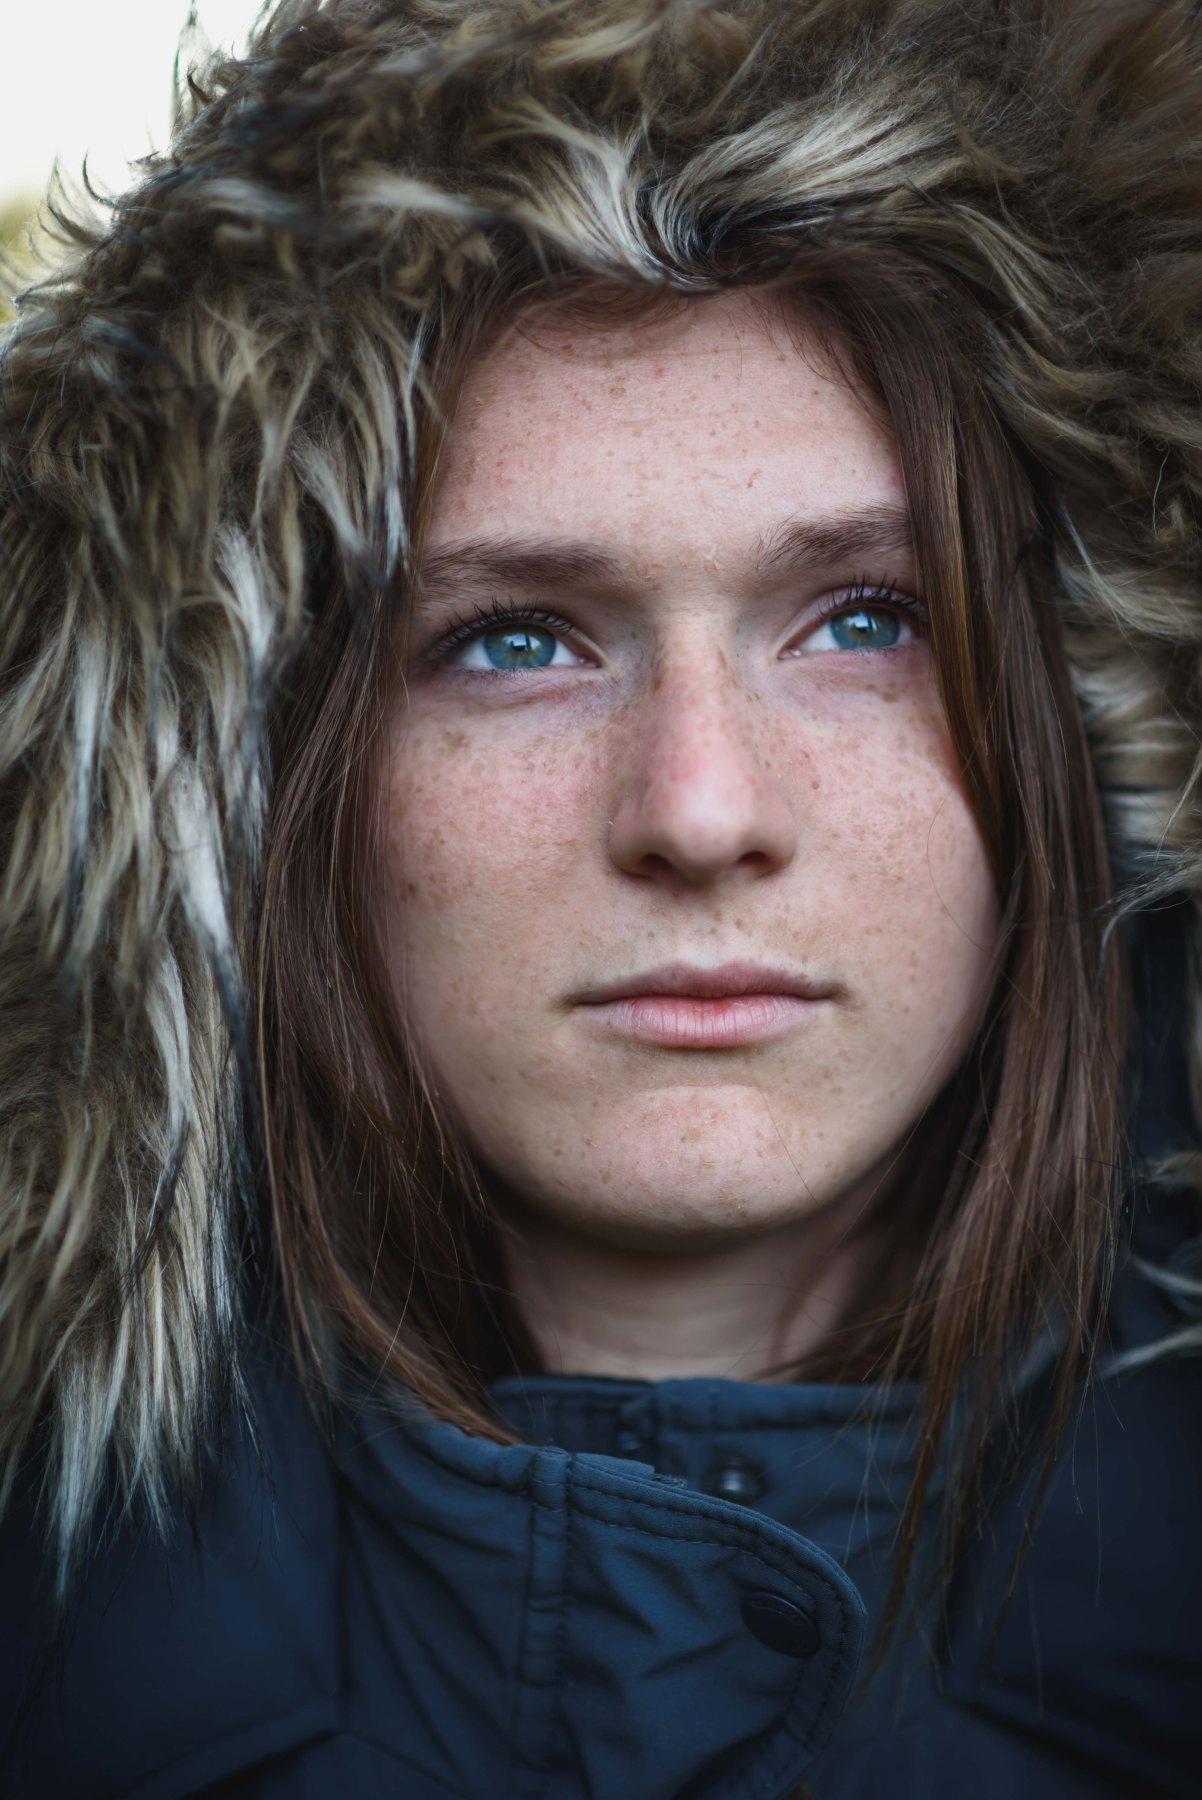 neilson family kids teens photography bay area photographer portrait headshot freckles eyes